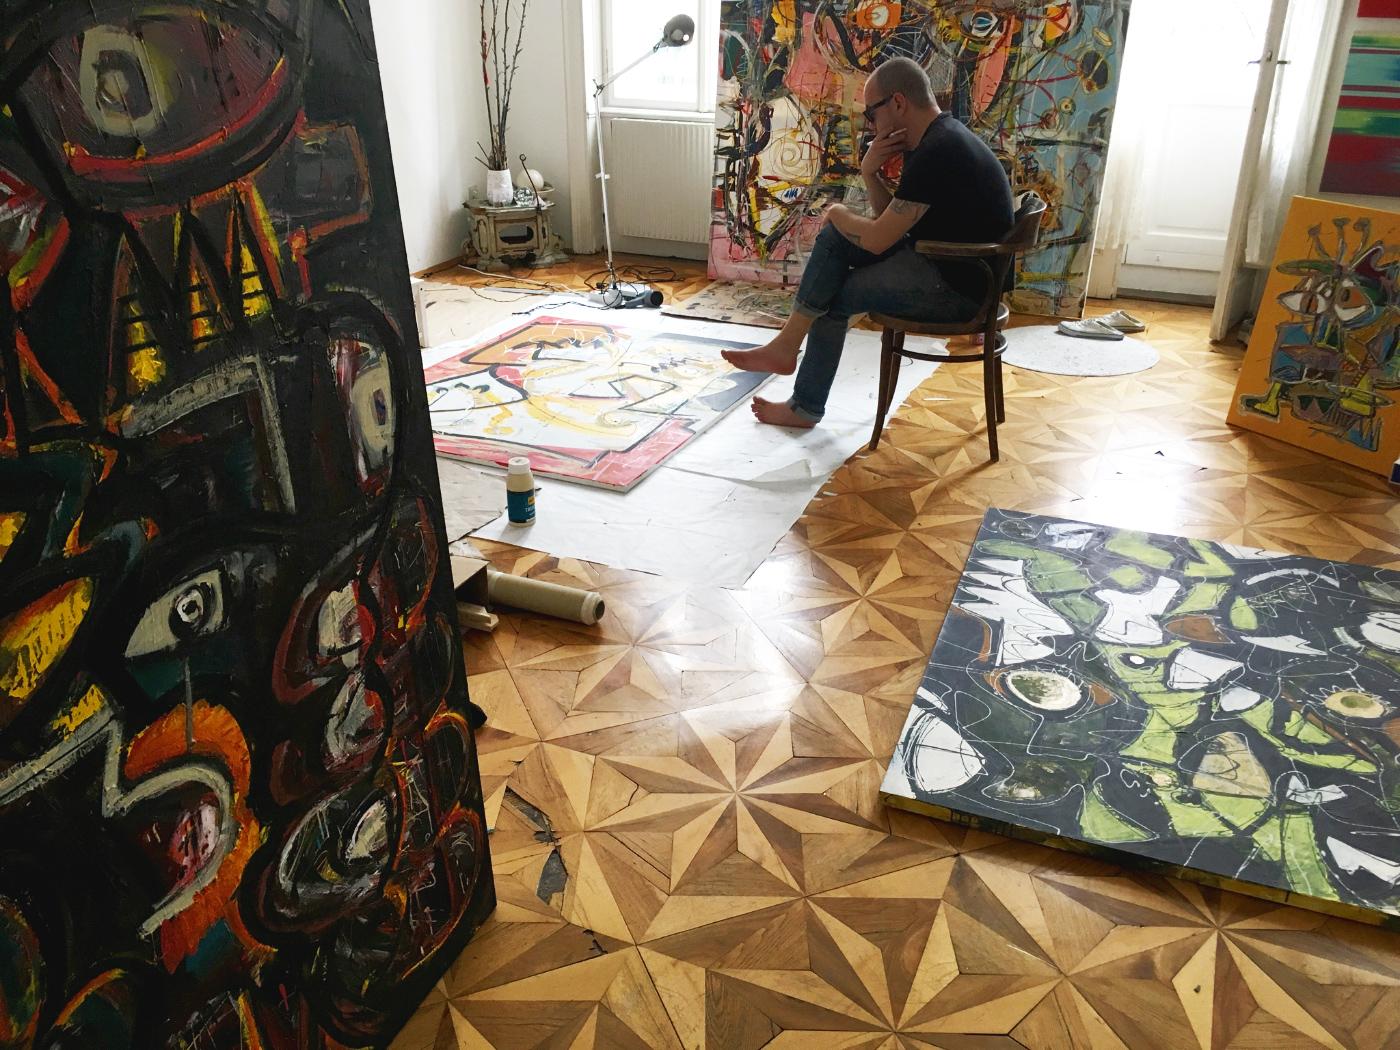 Adalierd_Painting_Abstract_Art_Contemporary_Vienna_2019_Parallel_Art_Collector_Adviser_Rob_Adalierd.jpg